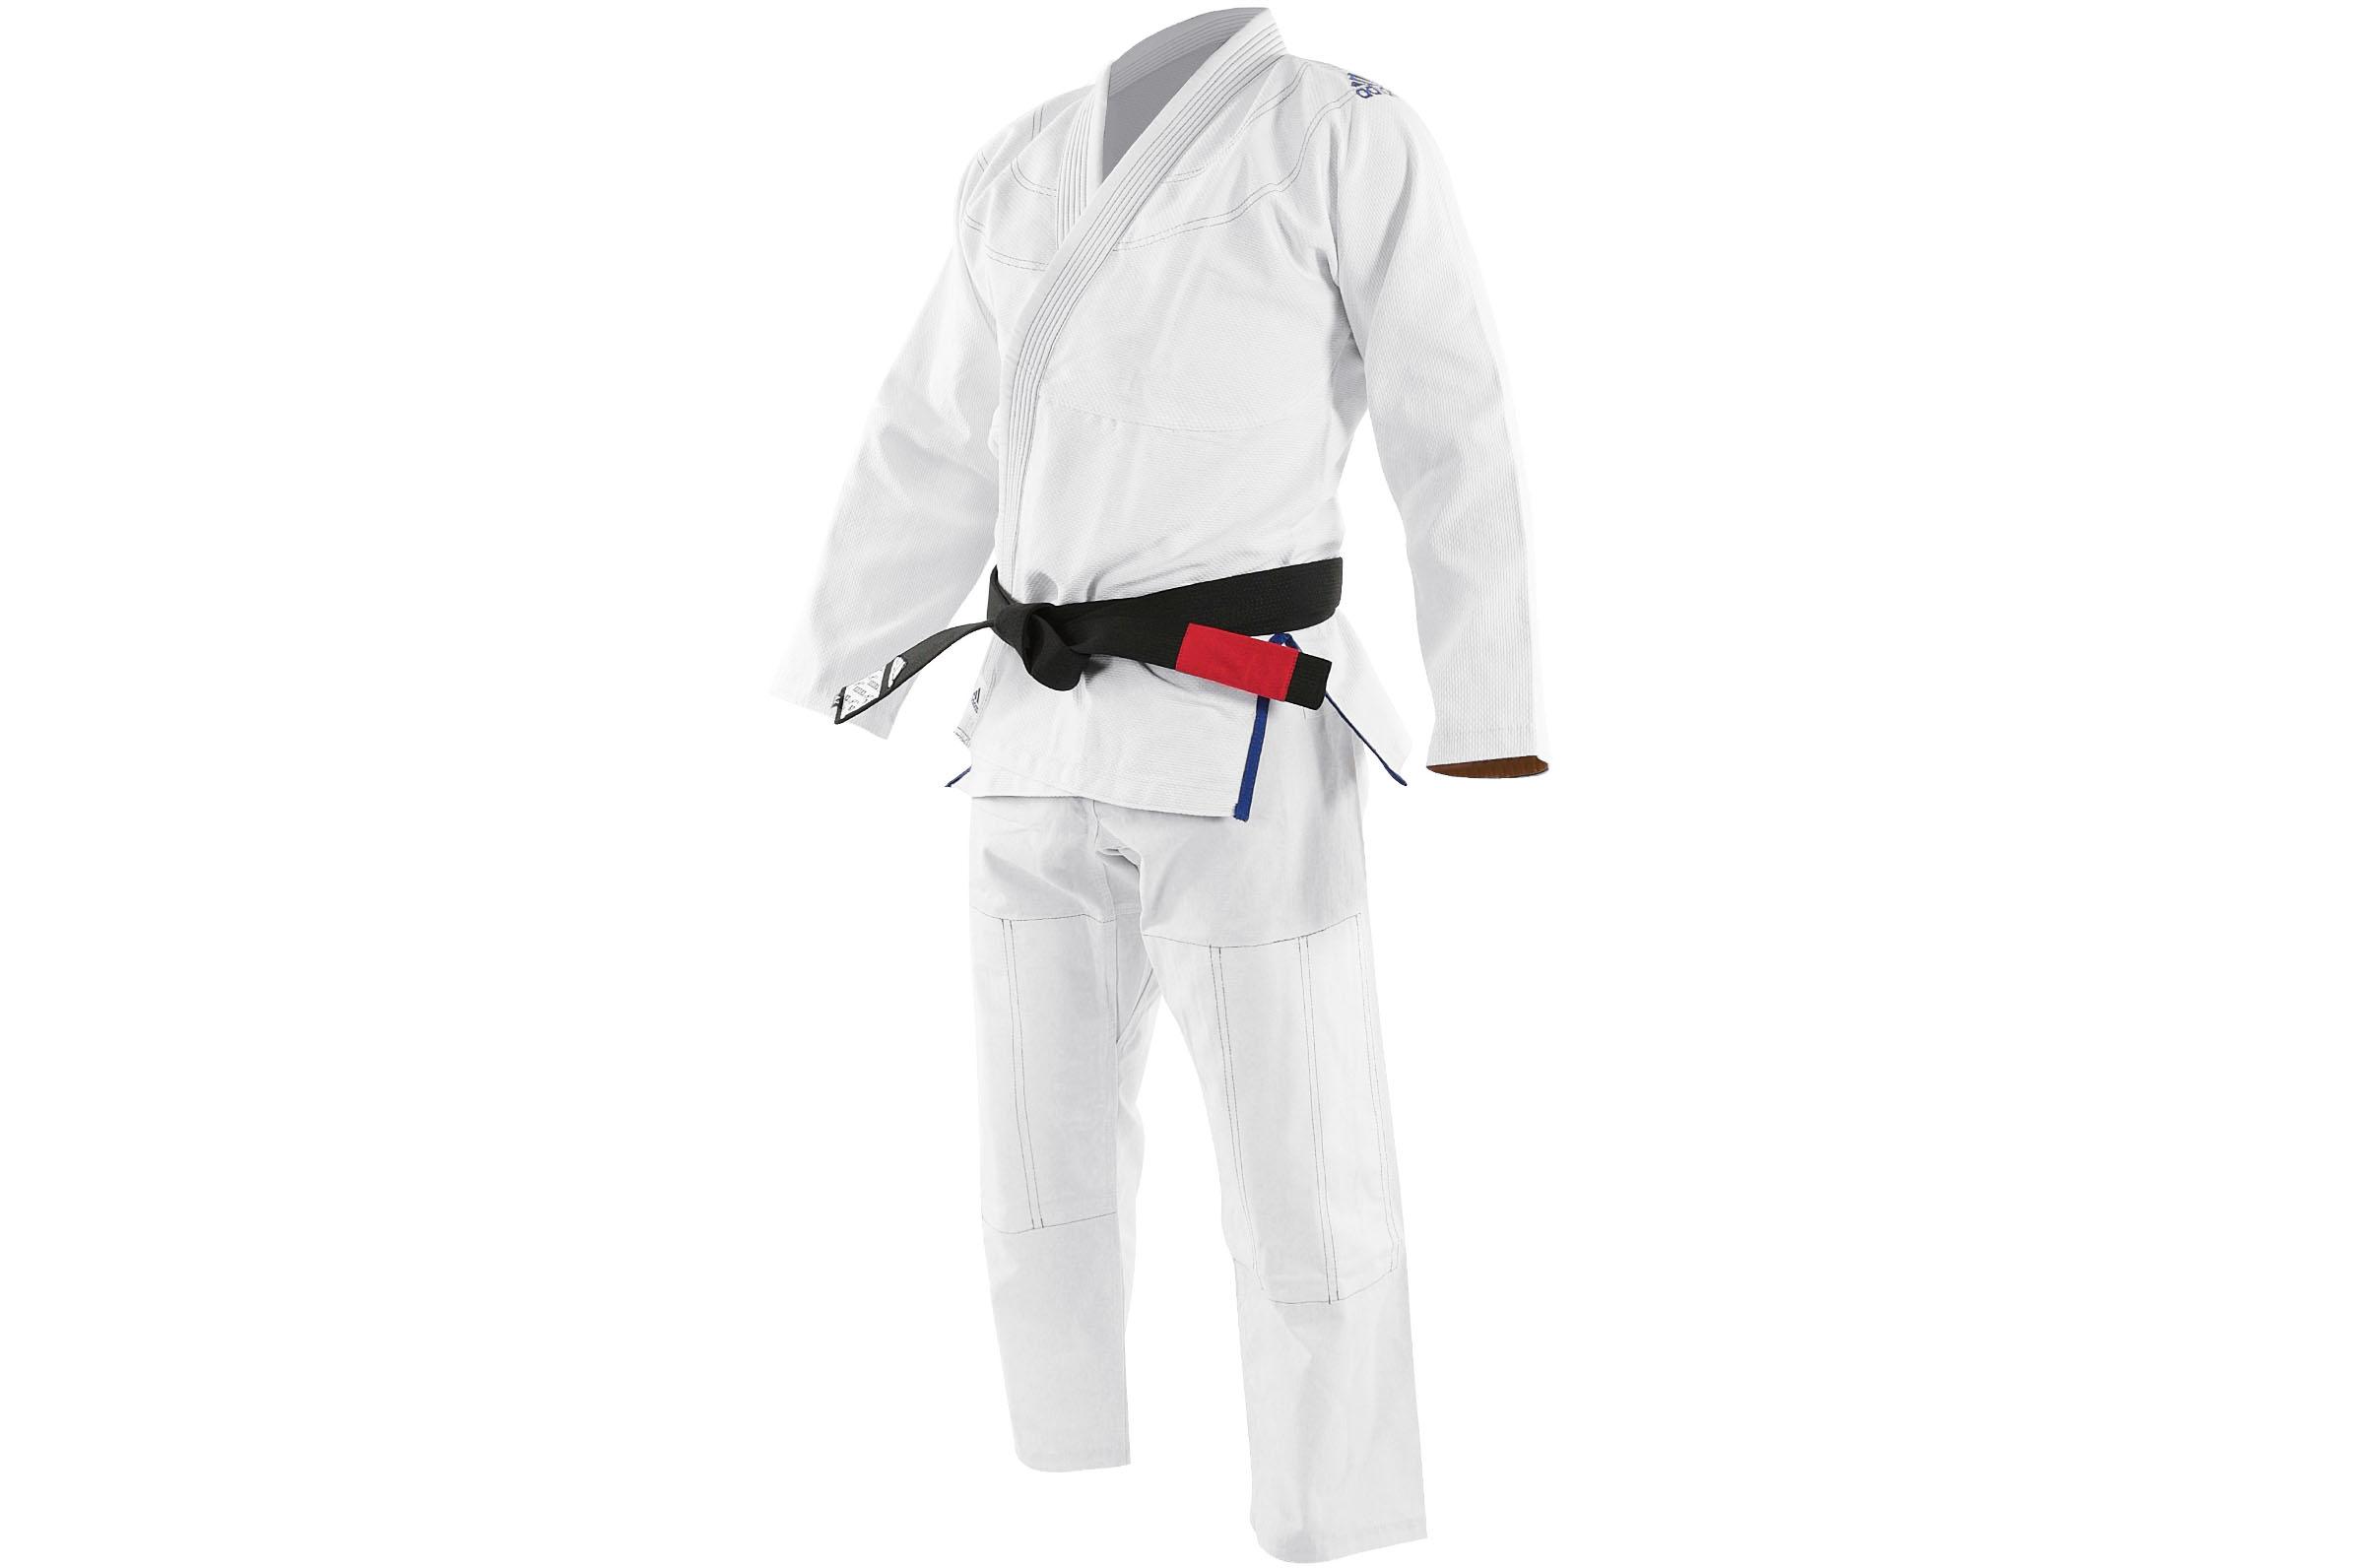 Kimono de Ju-Jitsu, JJ350, Adidas